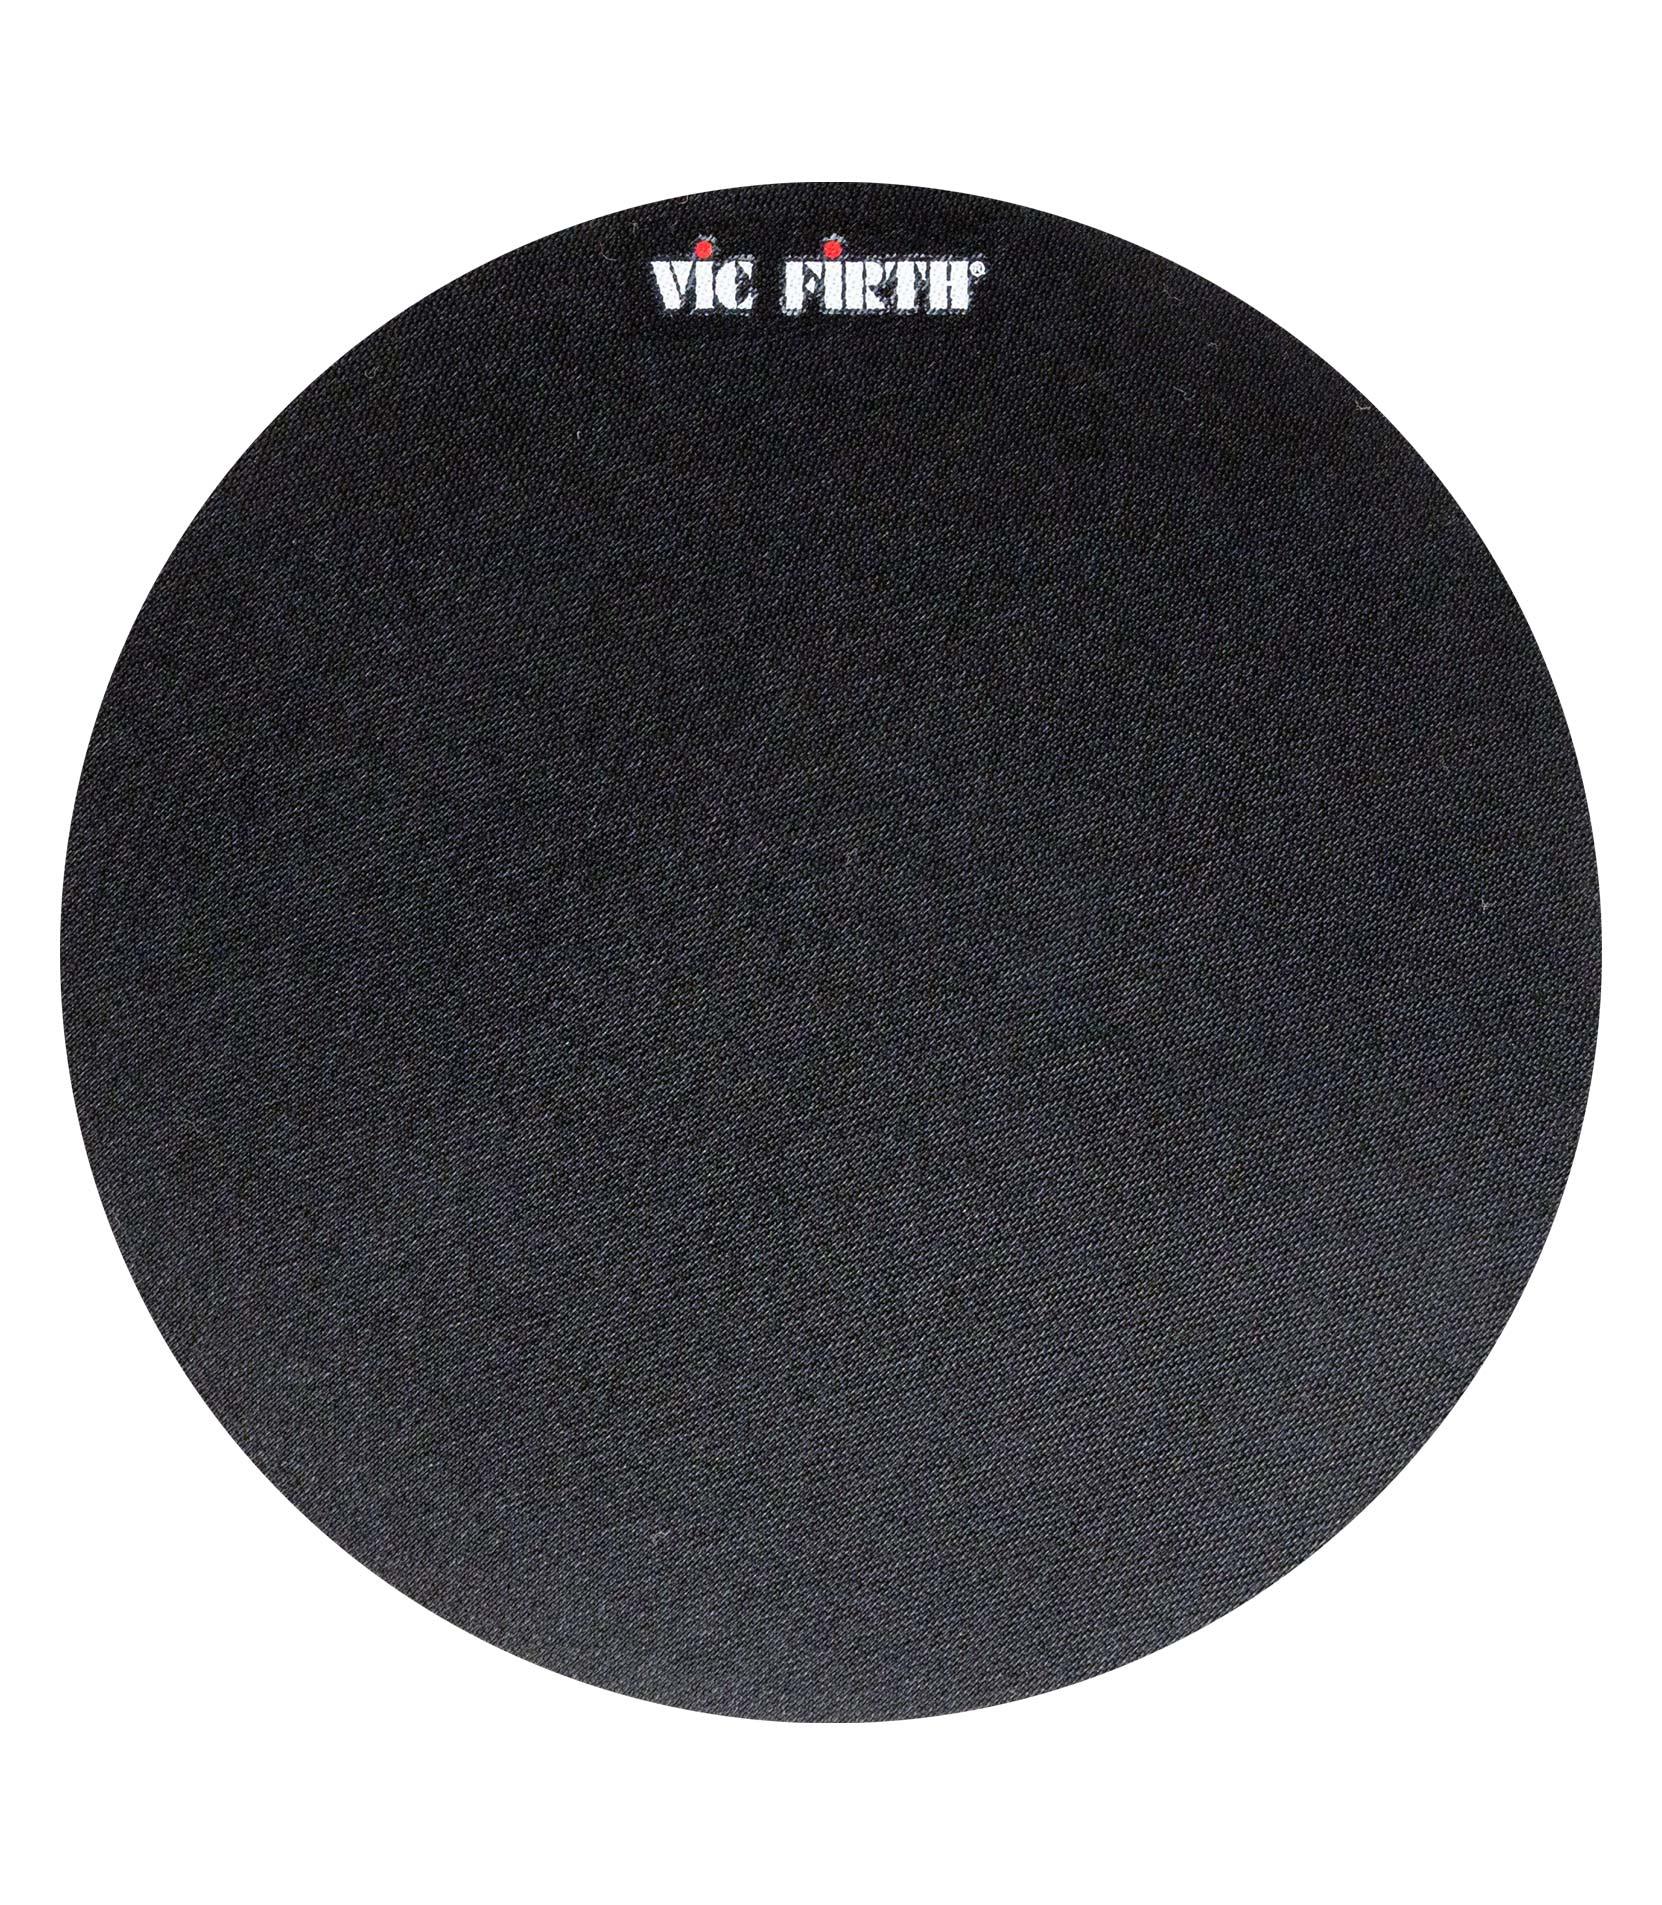 buy vicfirth vicmute14